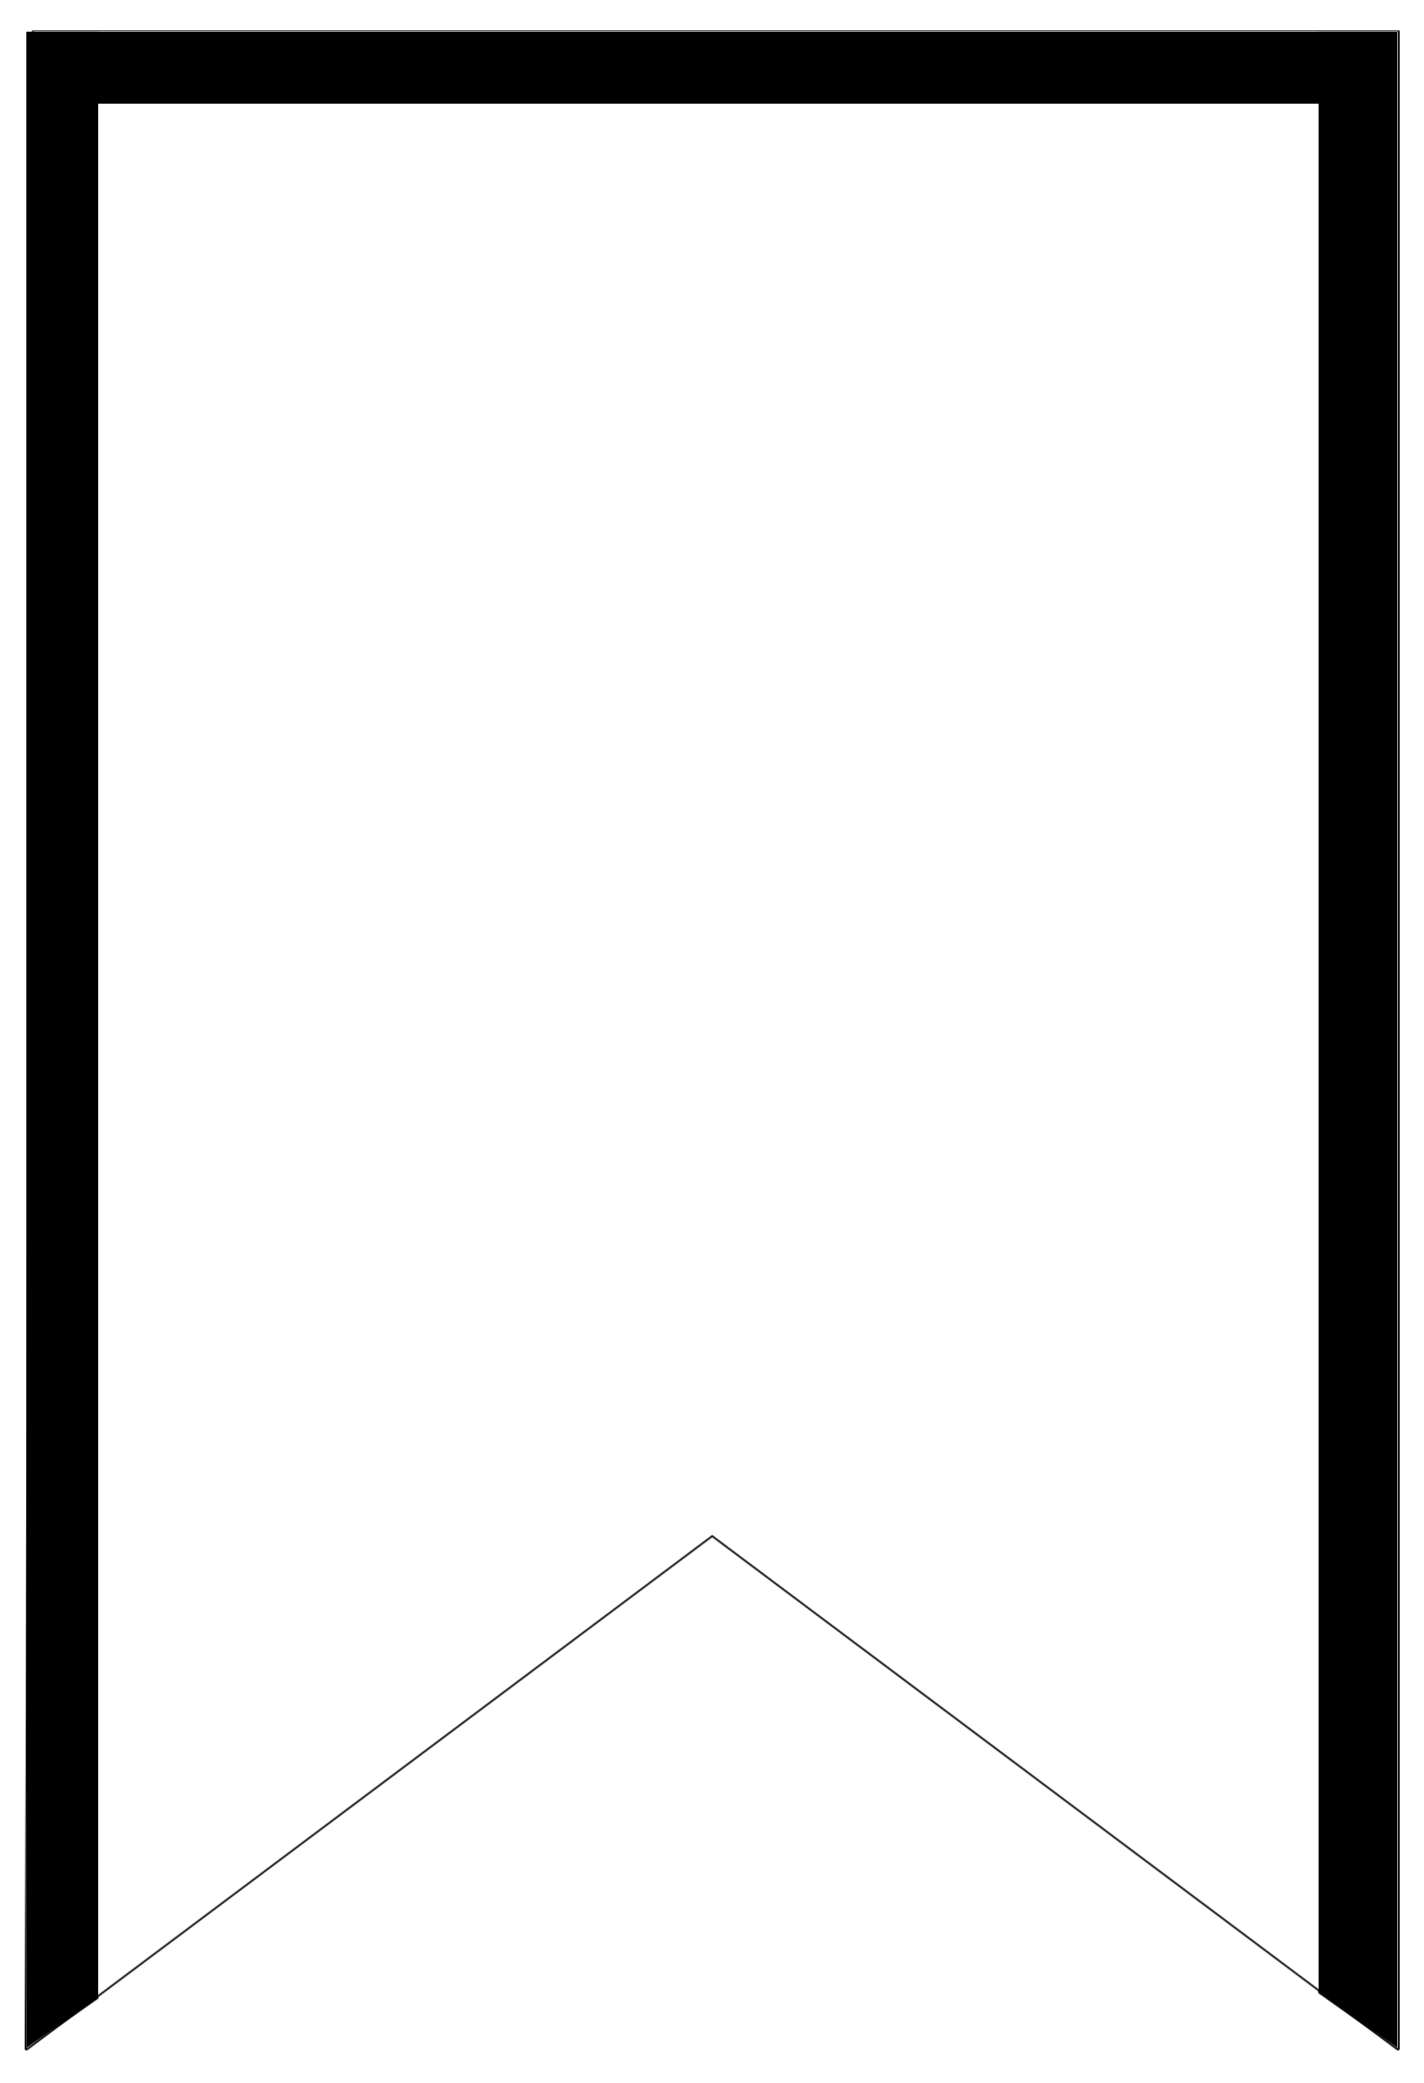 free printable banner templates blank banners diy banner free customizable banner flag